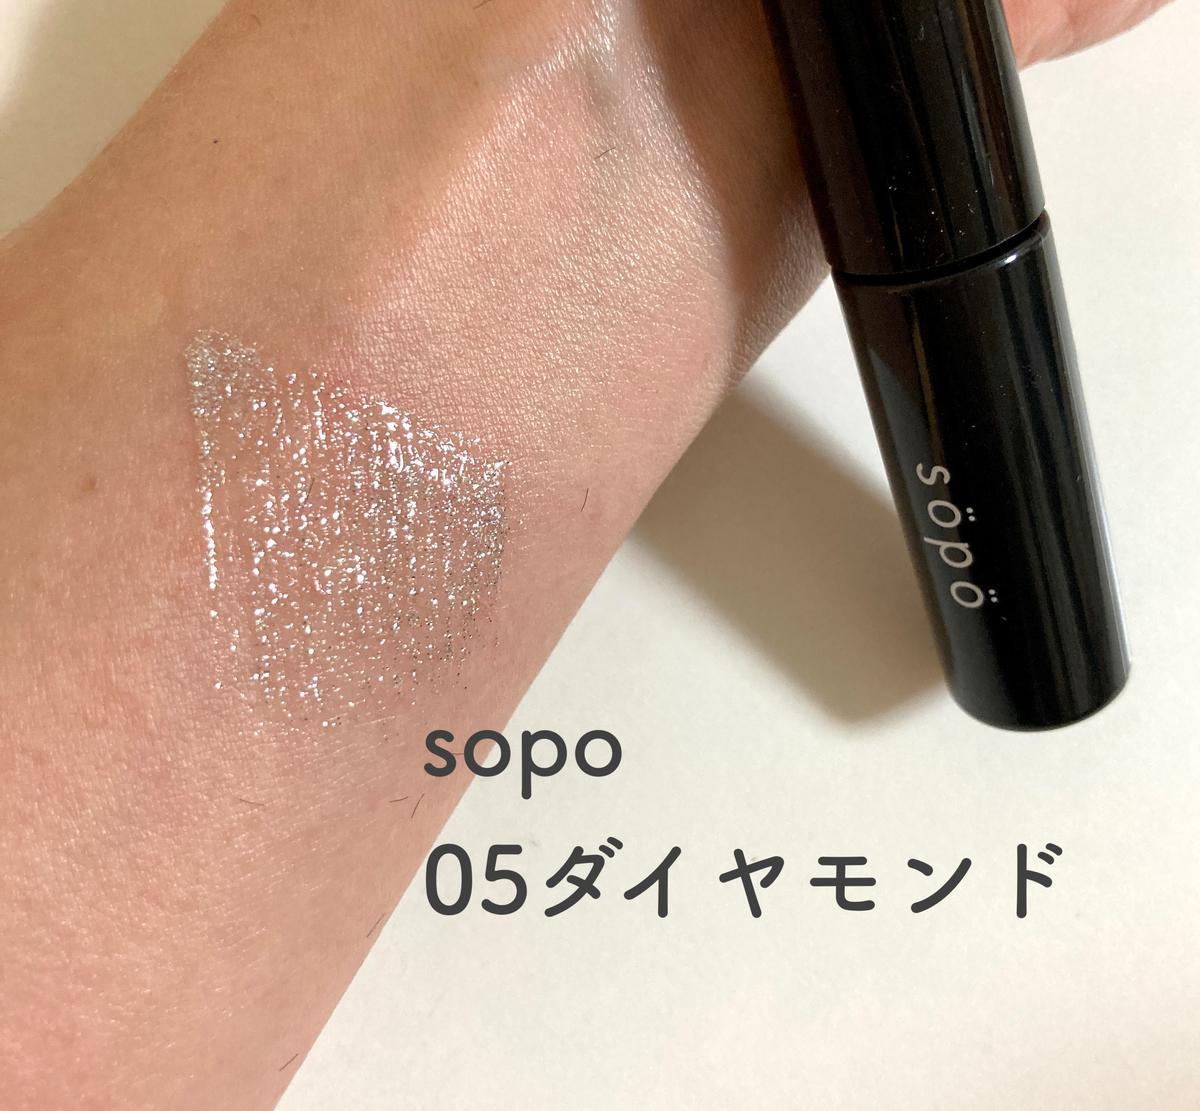 sopo ソポ ダイヤモンド